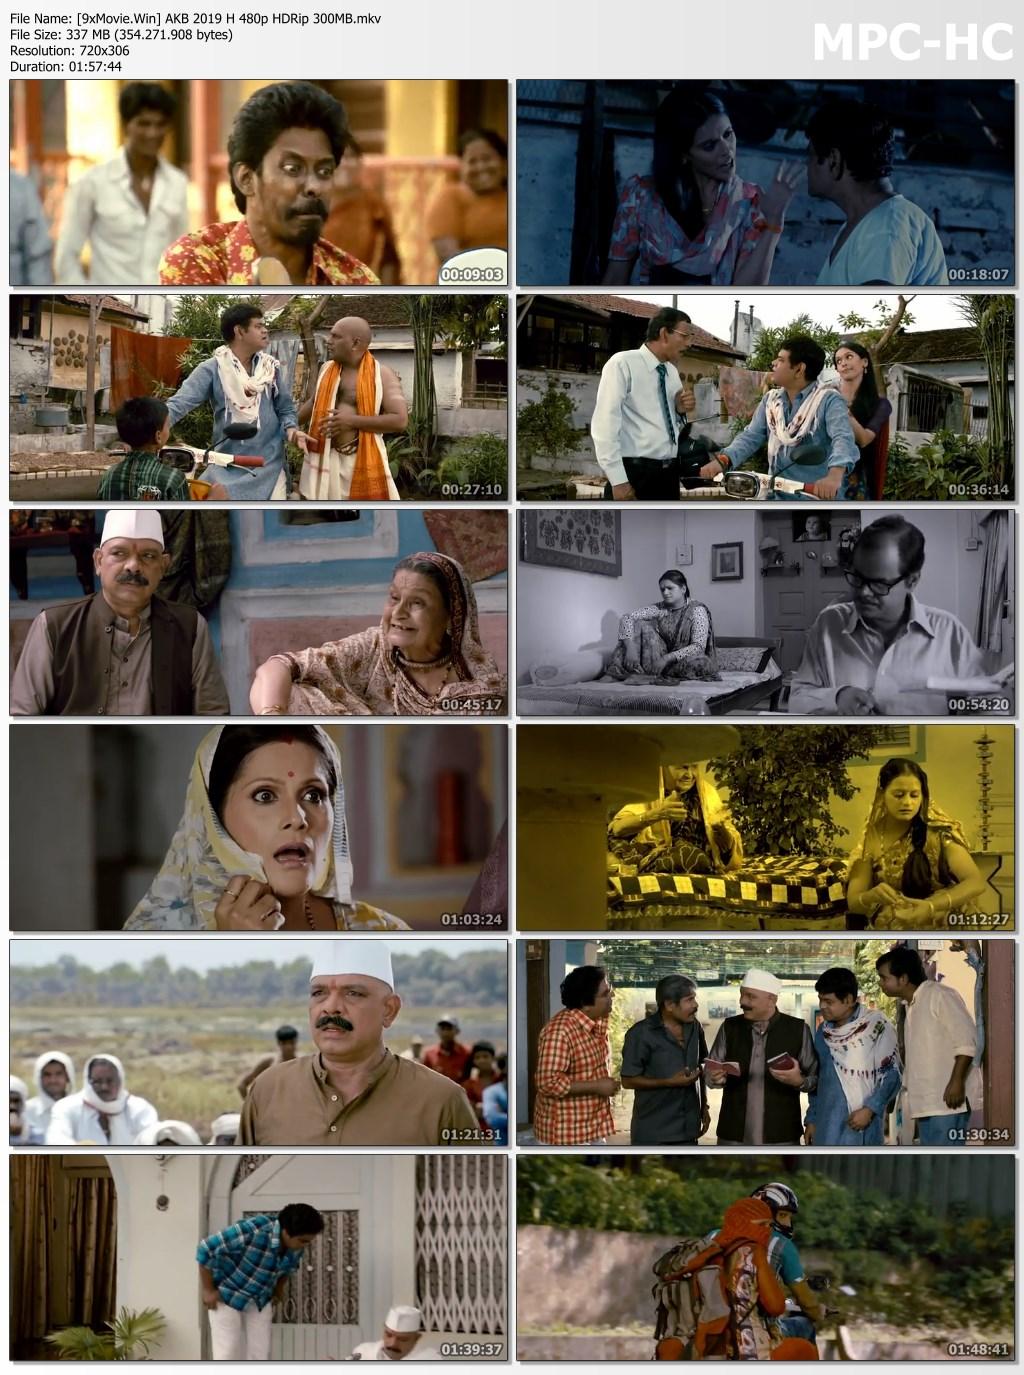 Ammaa Ki Boli 2019 Hindi 480p HDRip x264 300MB